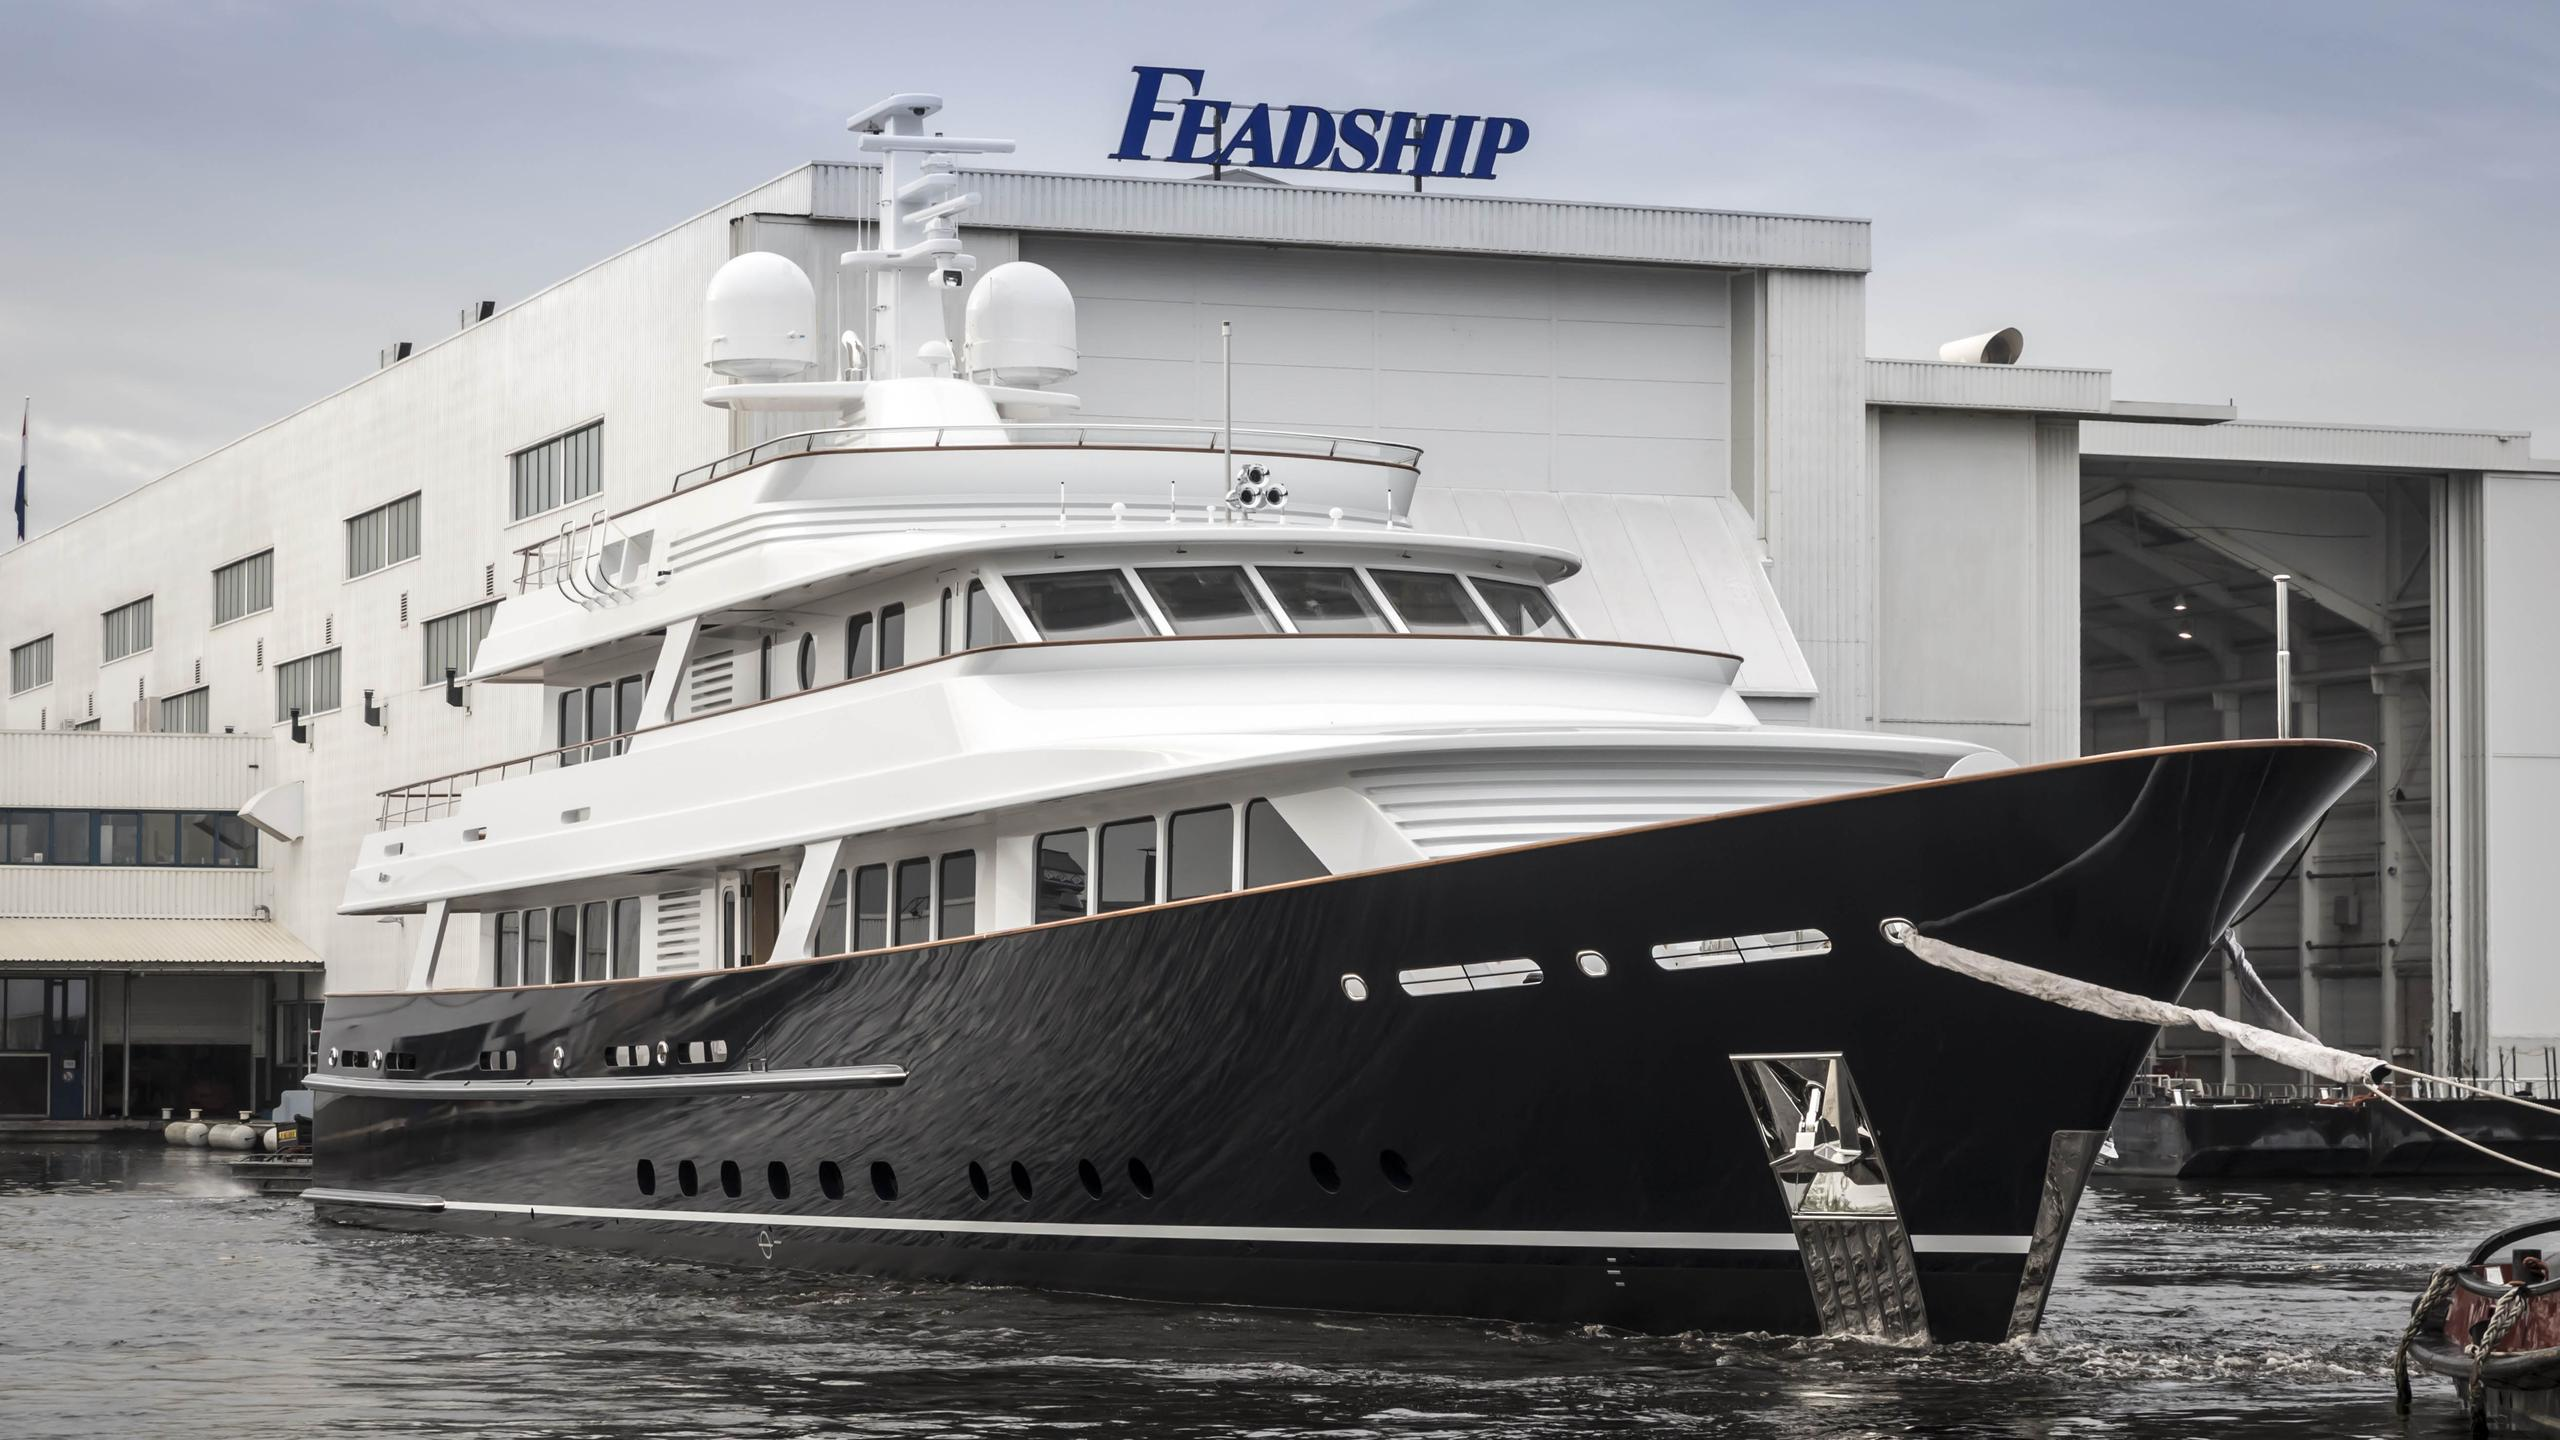 valoria b femke hull 697 motoryacht feadship 47m 2017 launch bow